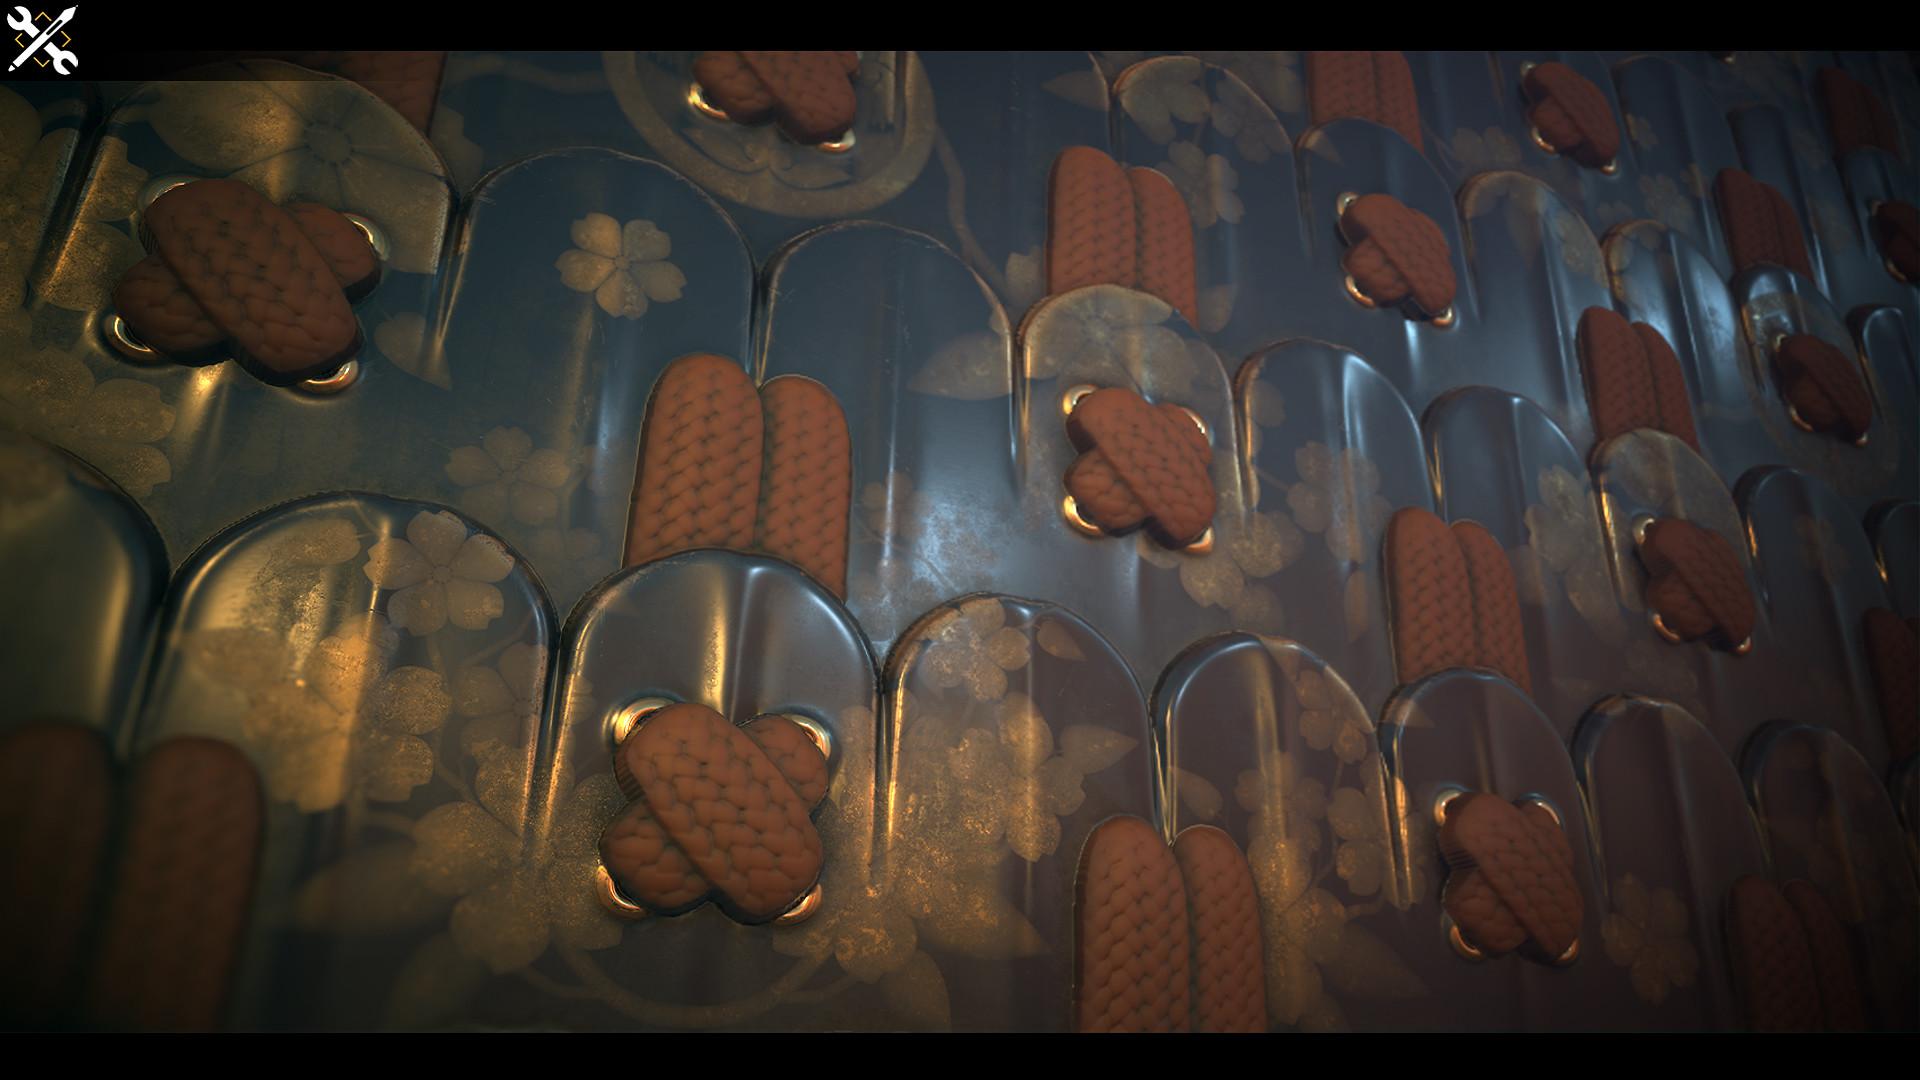 Jonas ronnegard jp ornamenttiles02